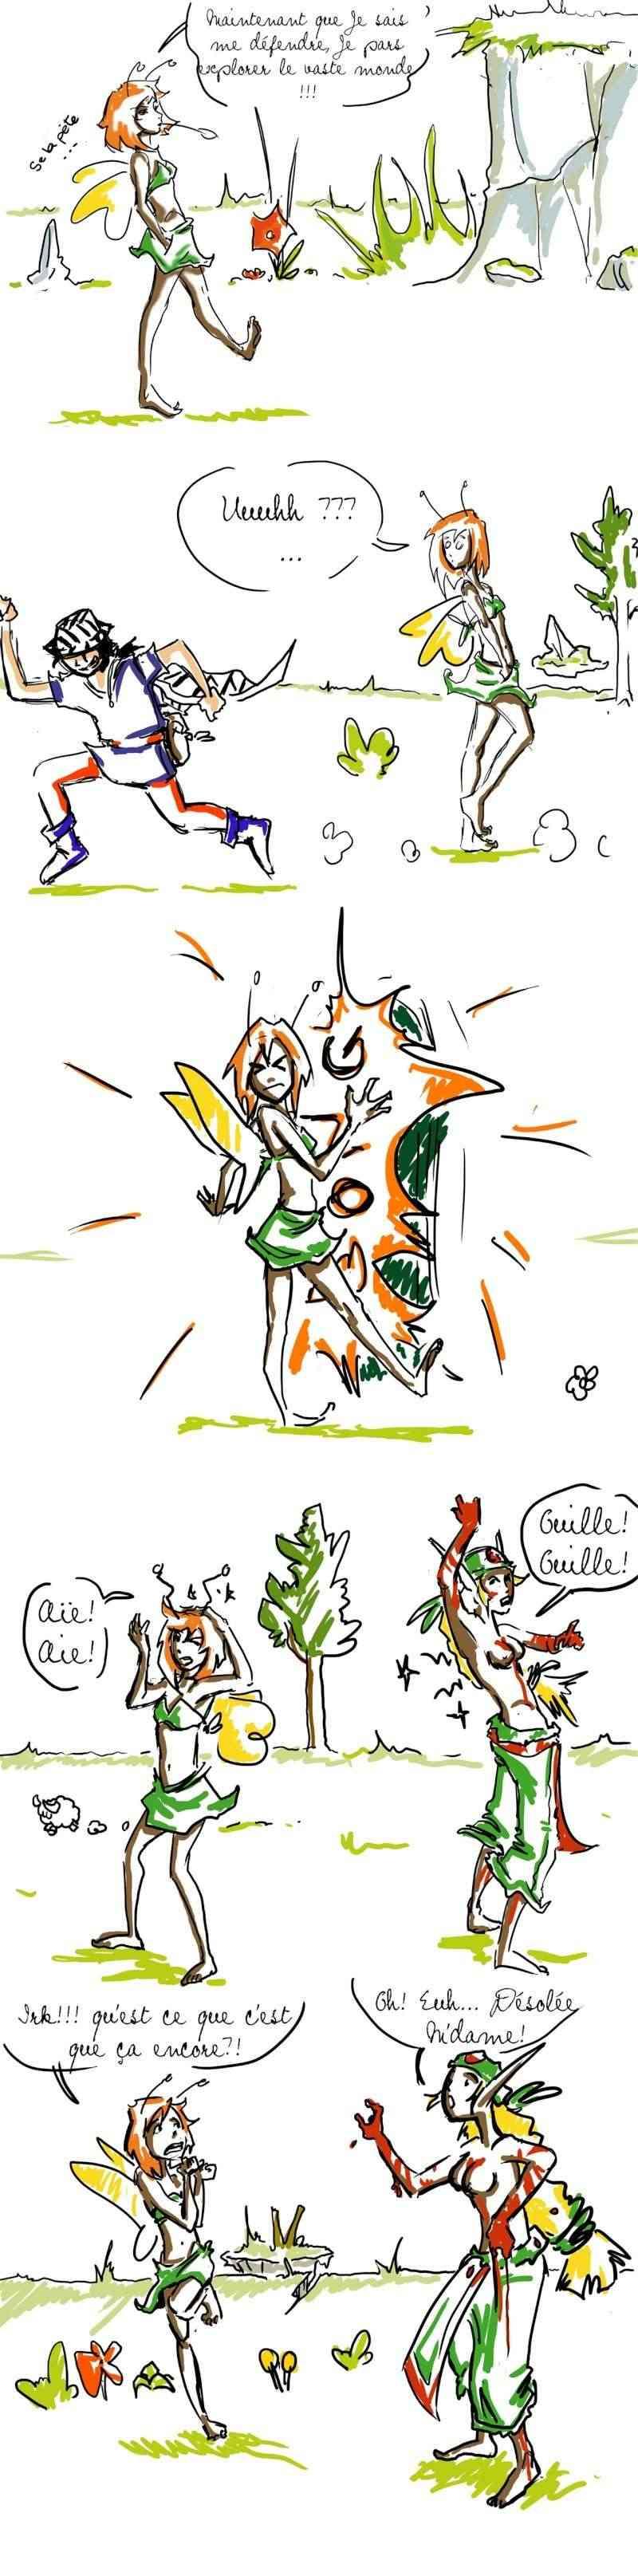 seik et ekis, les aventures ILLUSTREES - Page 5 Strip611